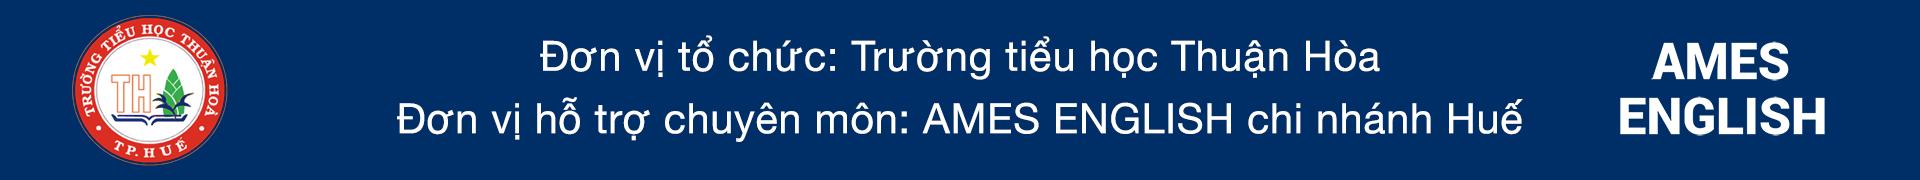 AMES ENGLISH